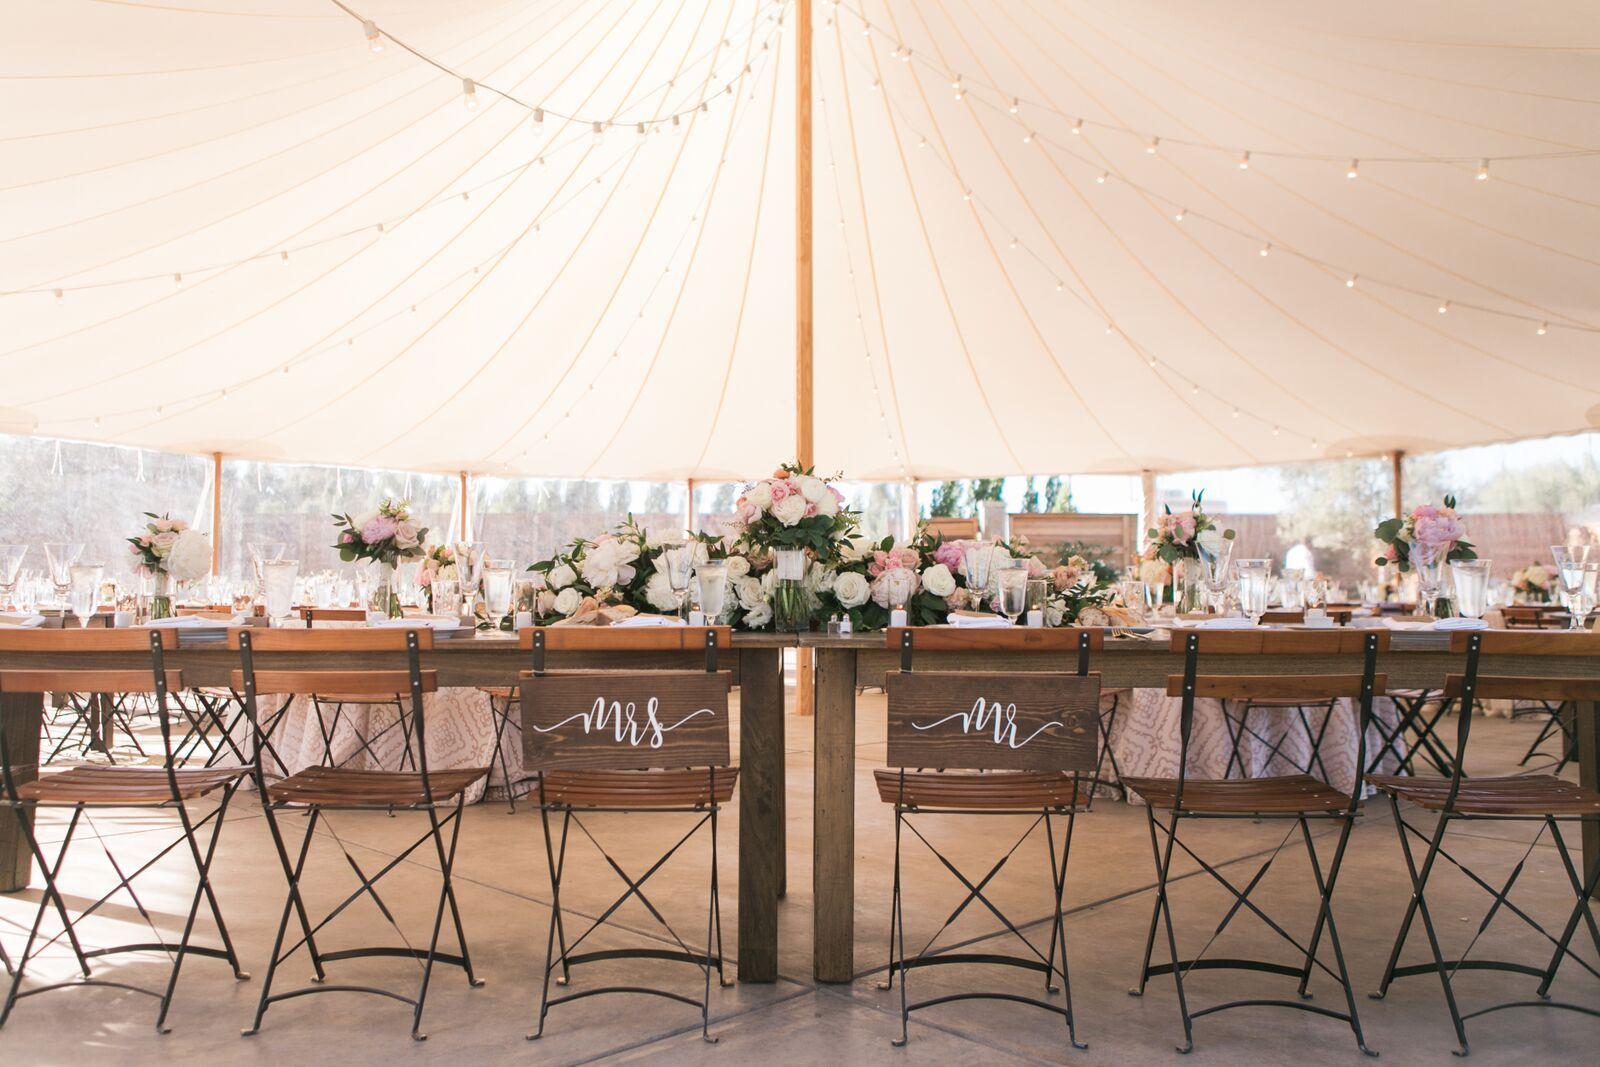 Wooden Slat Folding Chair Rental Encore Events Rentals Wedding Costs Wedding Flowers Affordable Wedding Invitations